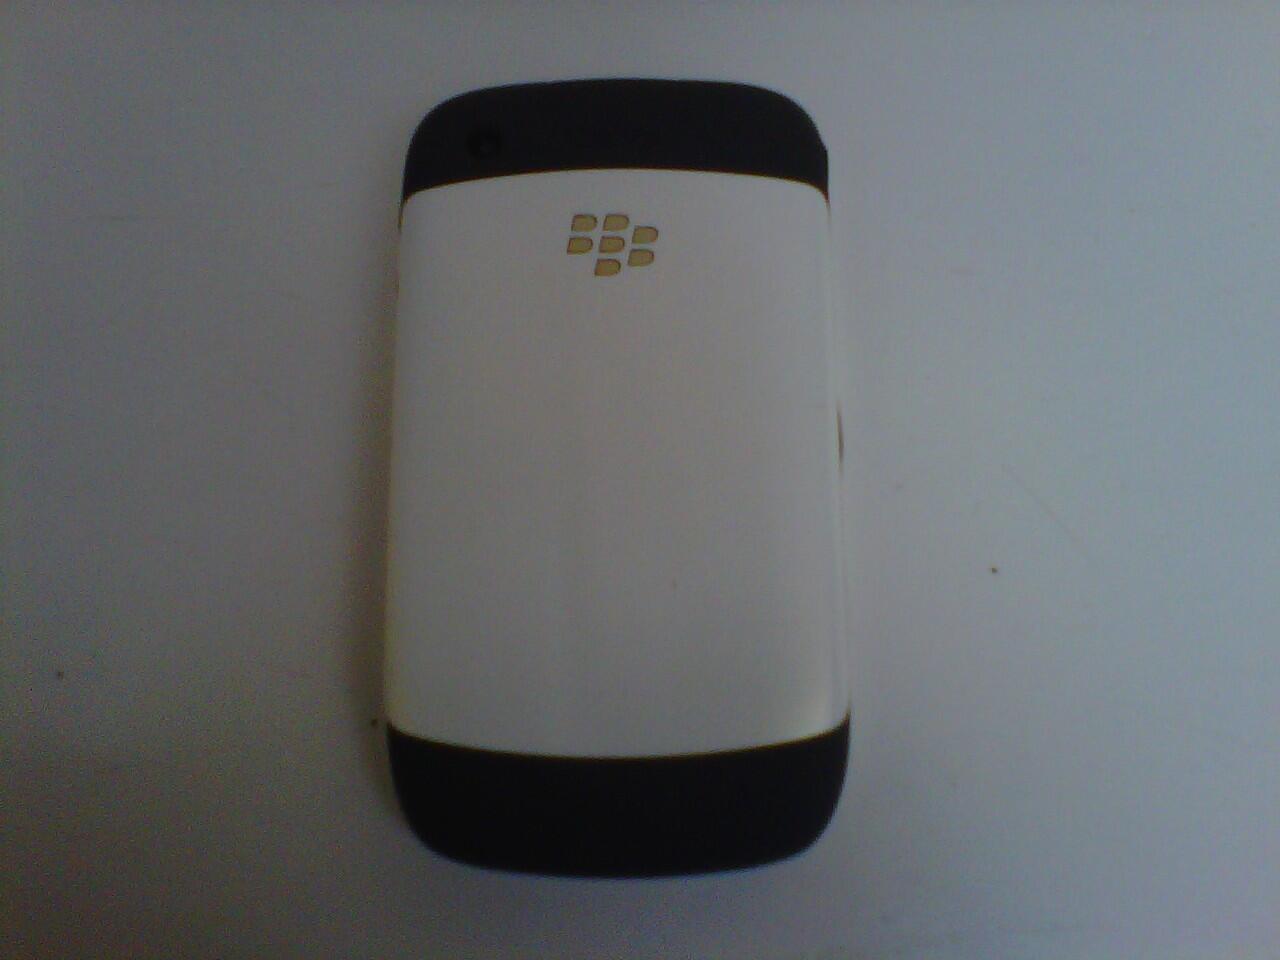 bleckberry gemini 8520, muluss white putih masih garansi CTN